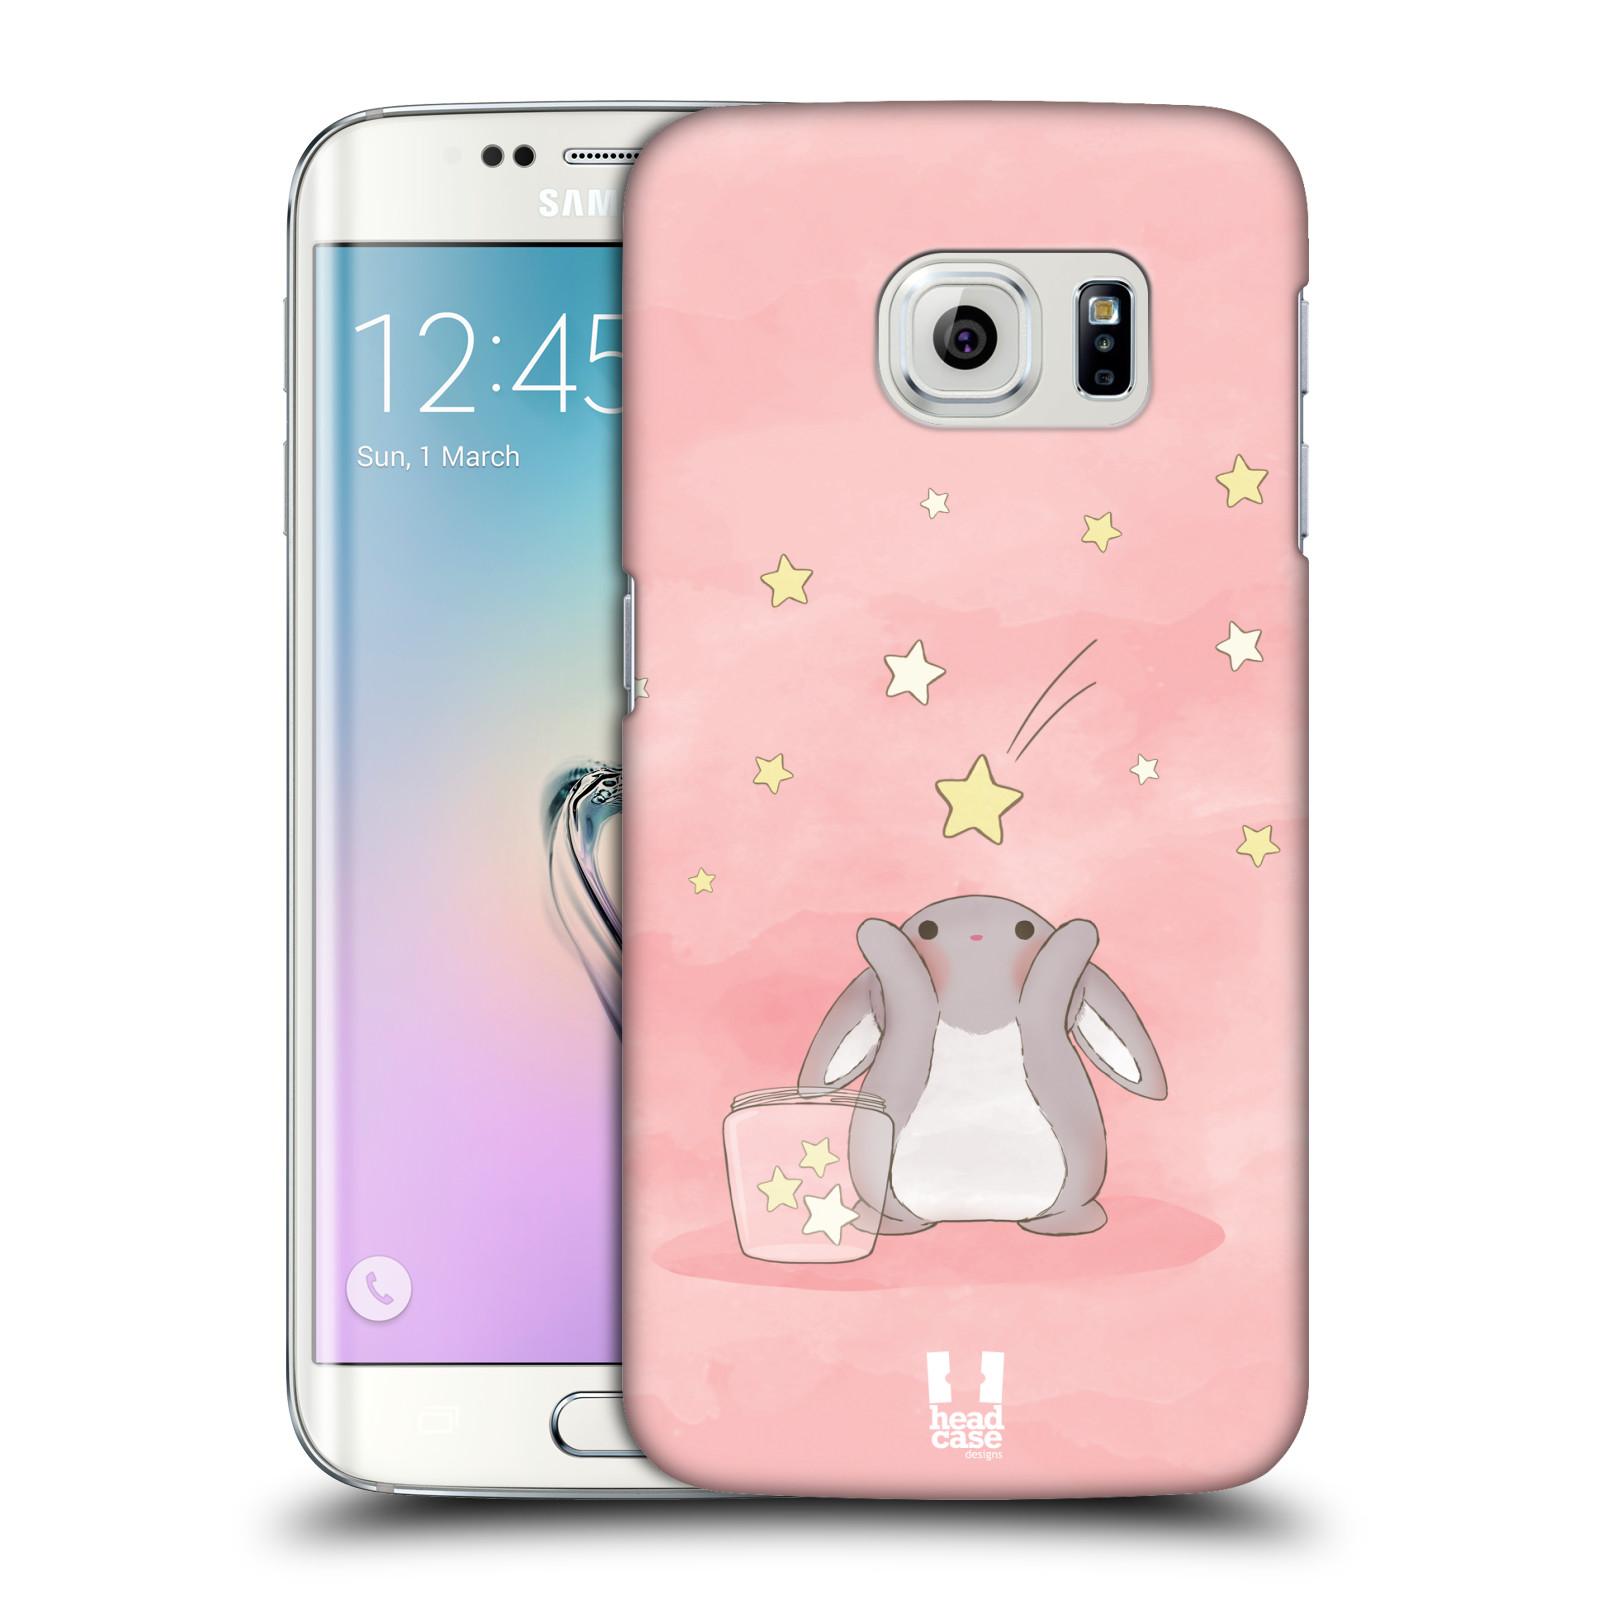 HEAD CASE plastový obal na mobil SAMSUNG Galaxy S6 EDGE (G9250, G925, G925F) vzor králíček a hvězdy růžová